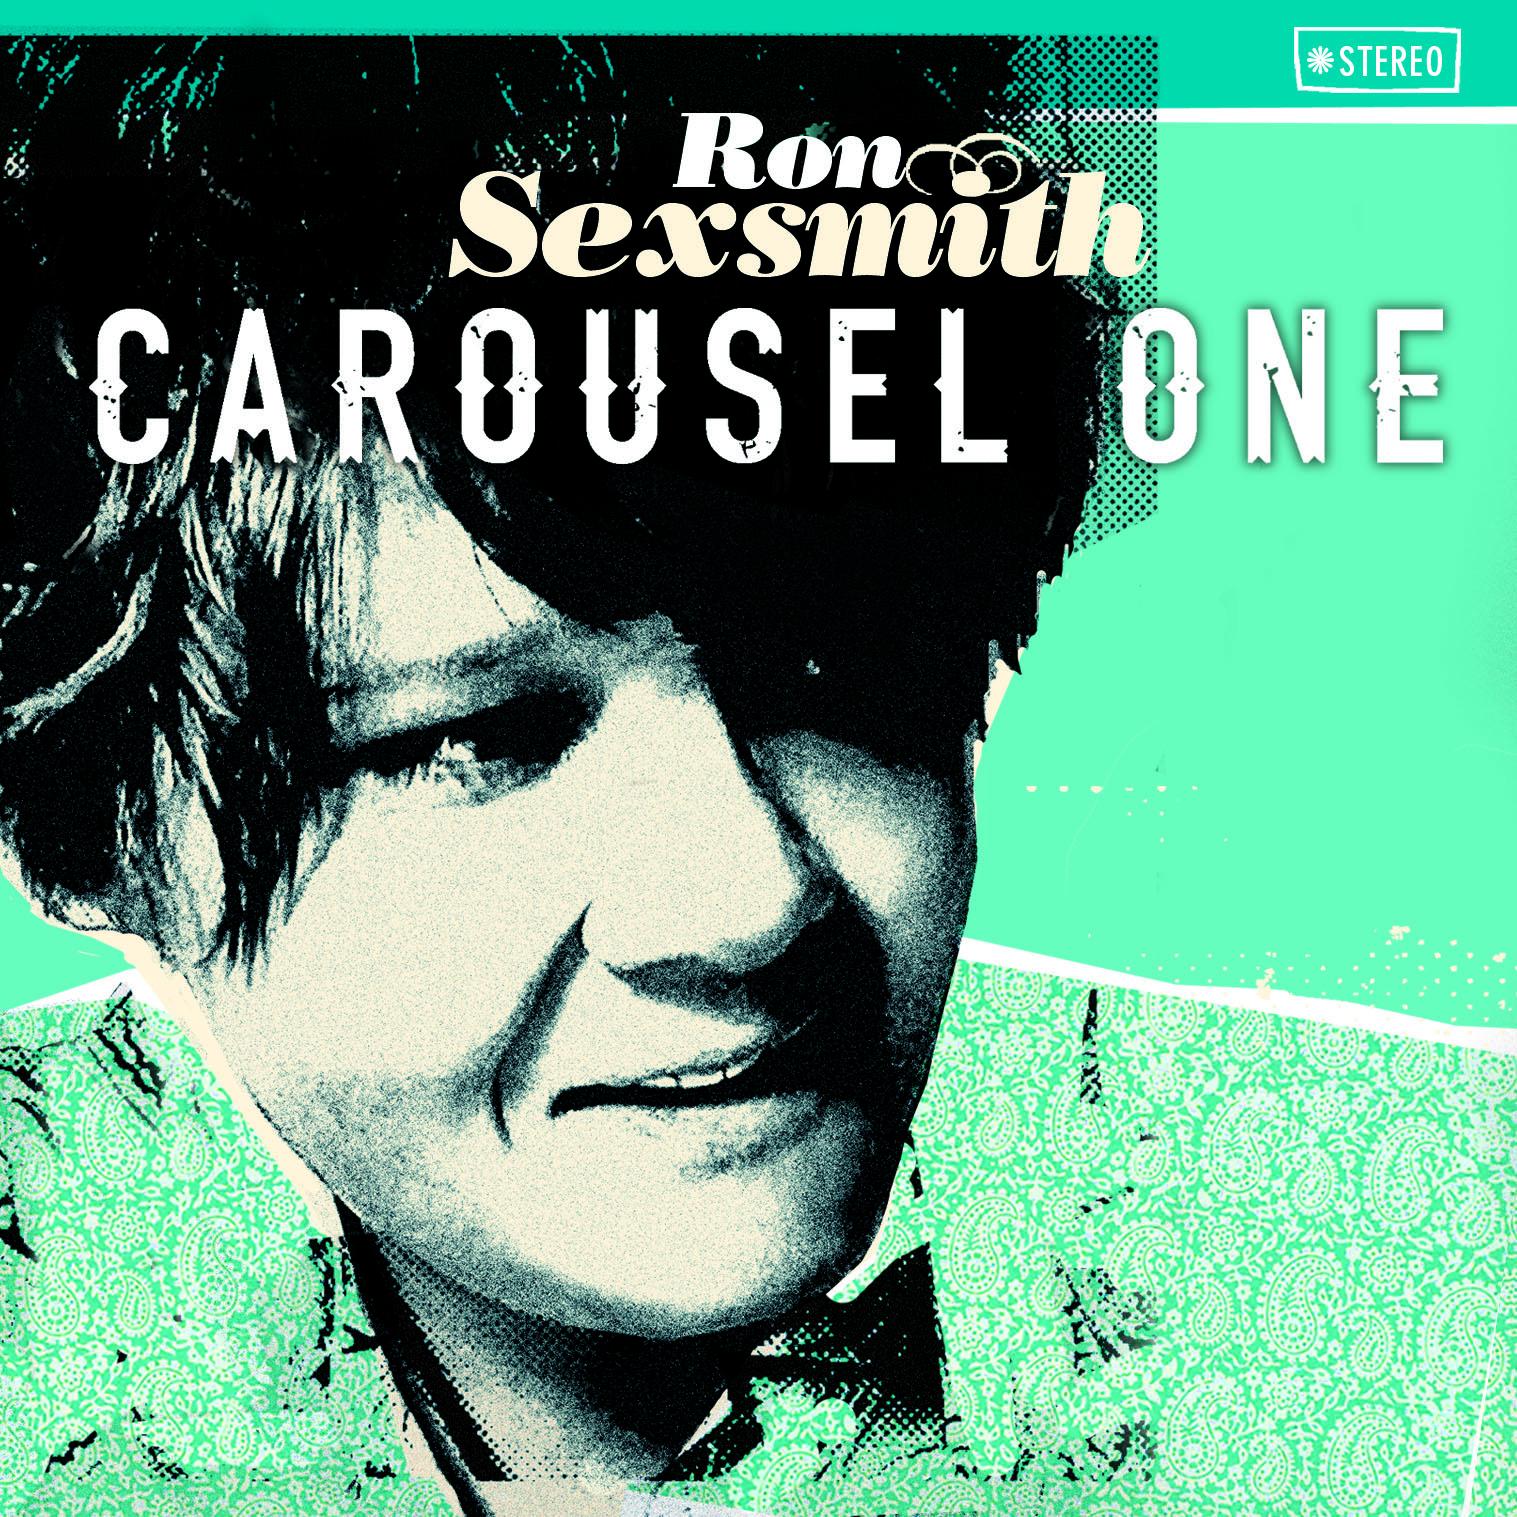 Carousel One - Ron Sexsmith - Musik - Cooking Vinyl - 0711297511314 - 30/3-2015